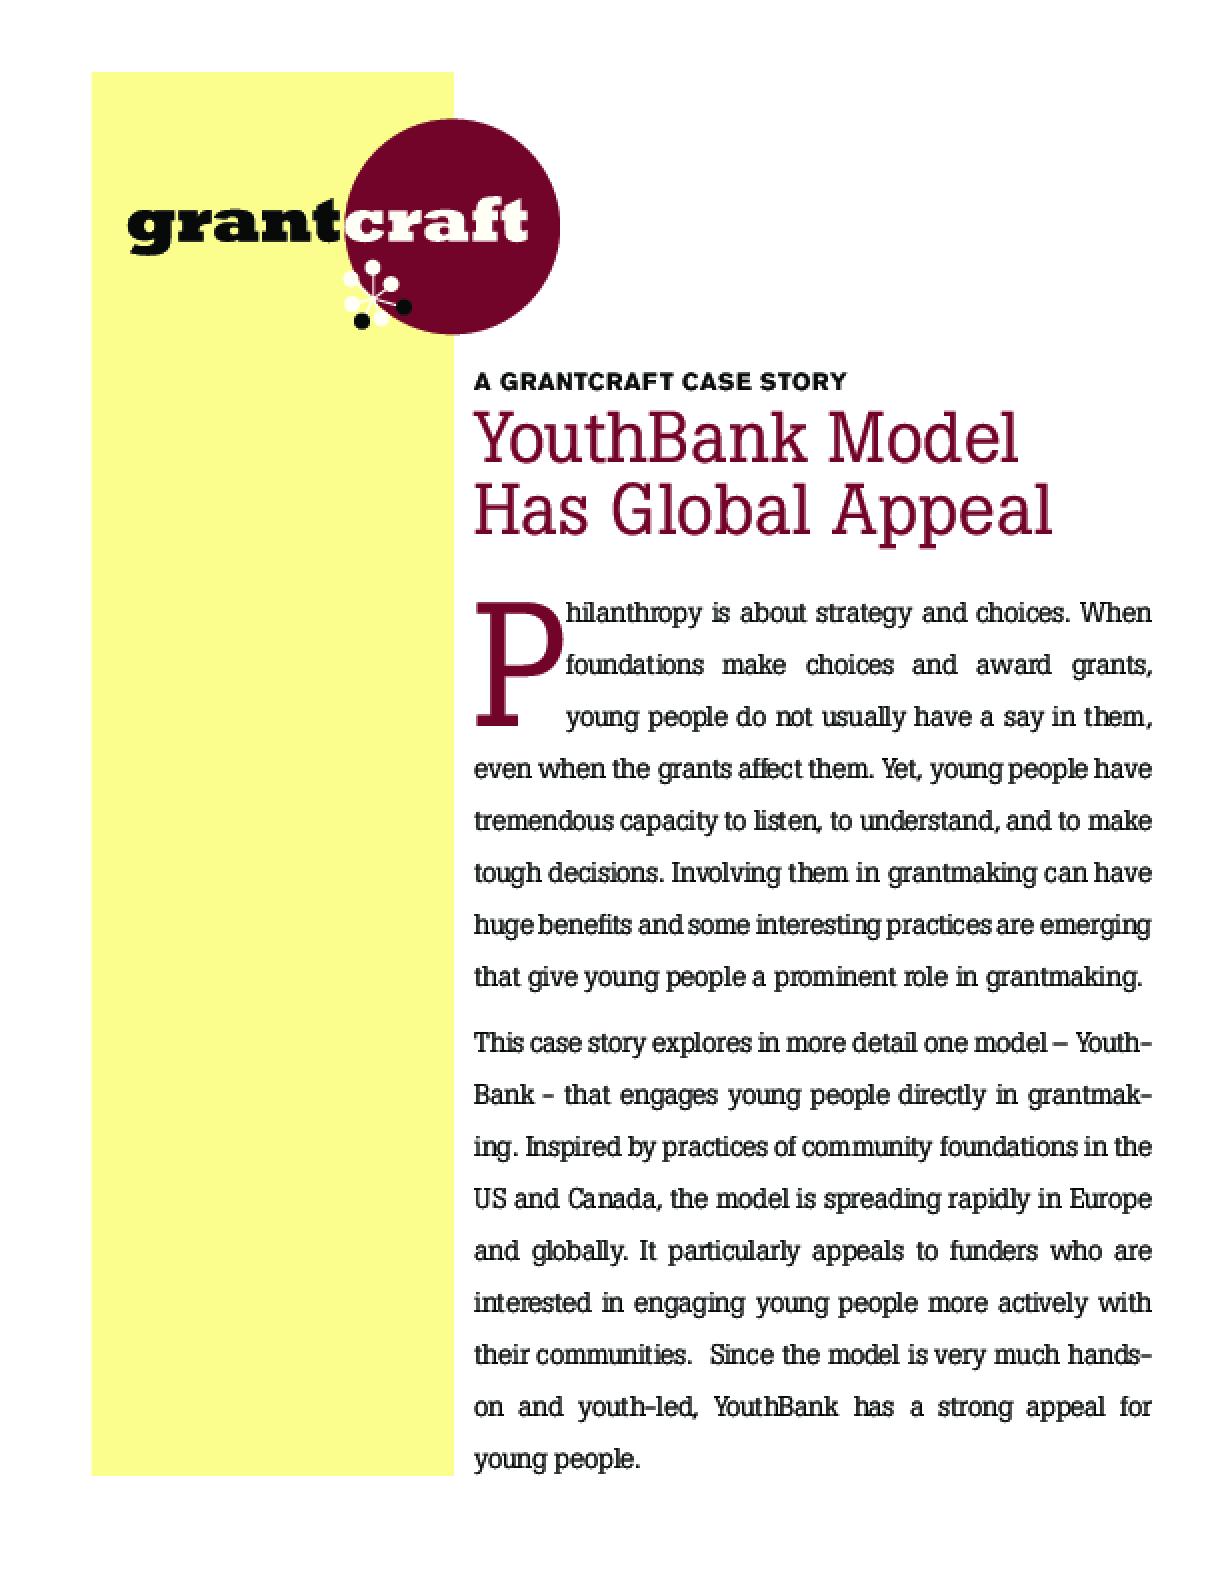 YouthBank Model Has Global Appeal